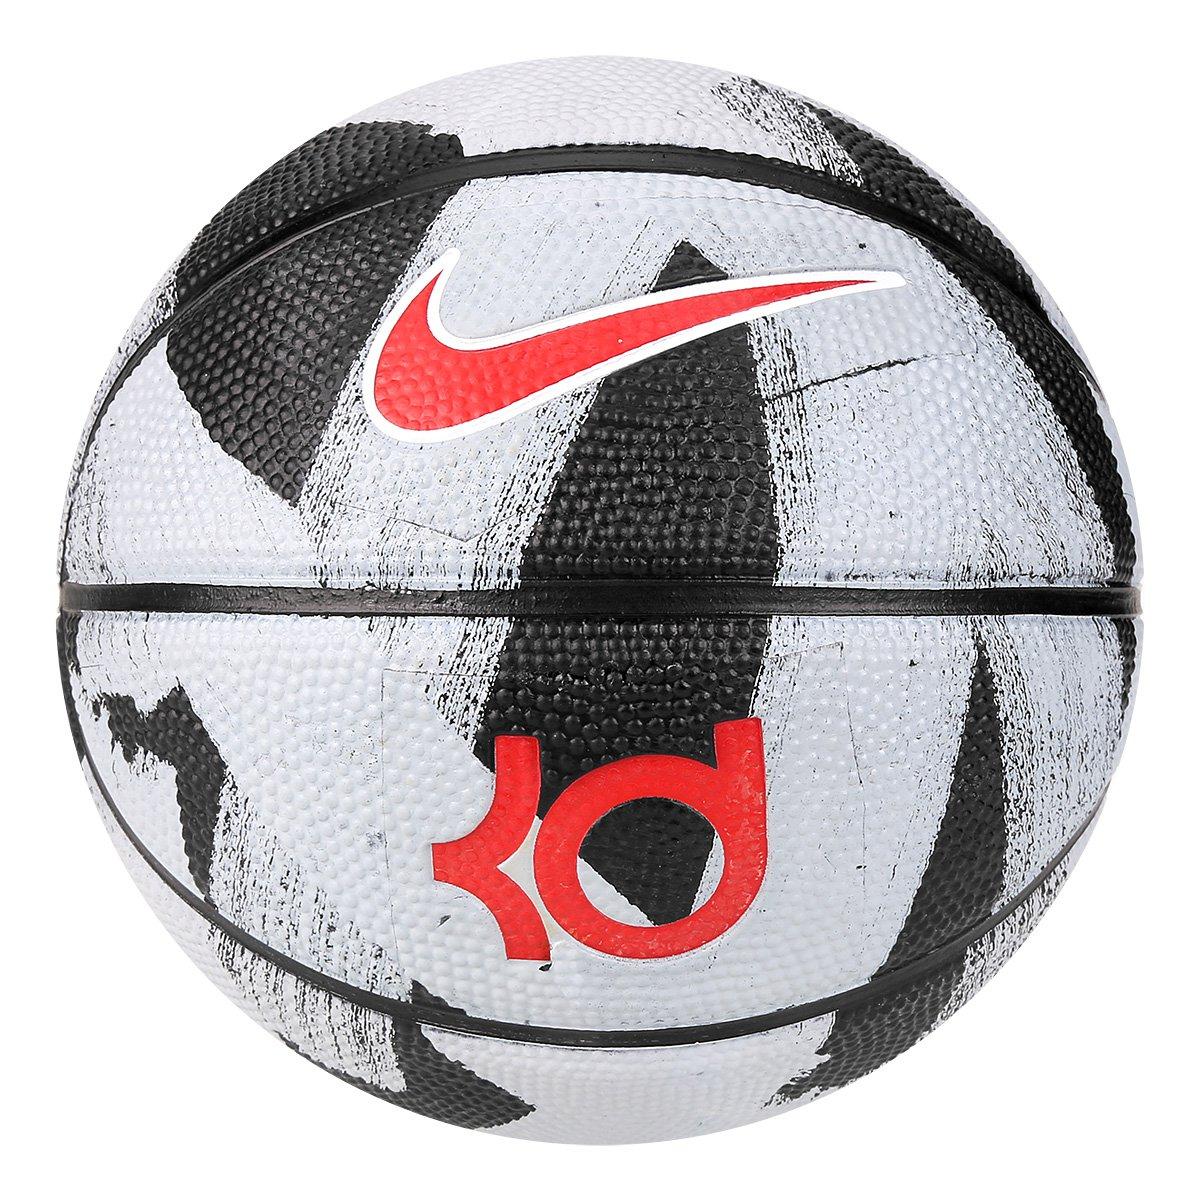 49db36d9e9f Mini Bola Basquete Nike KD Tam 3 - Compre Agora